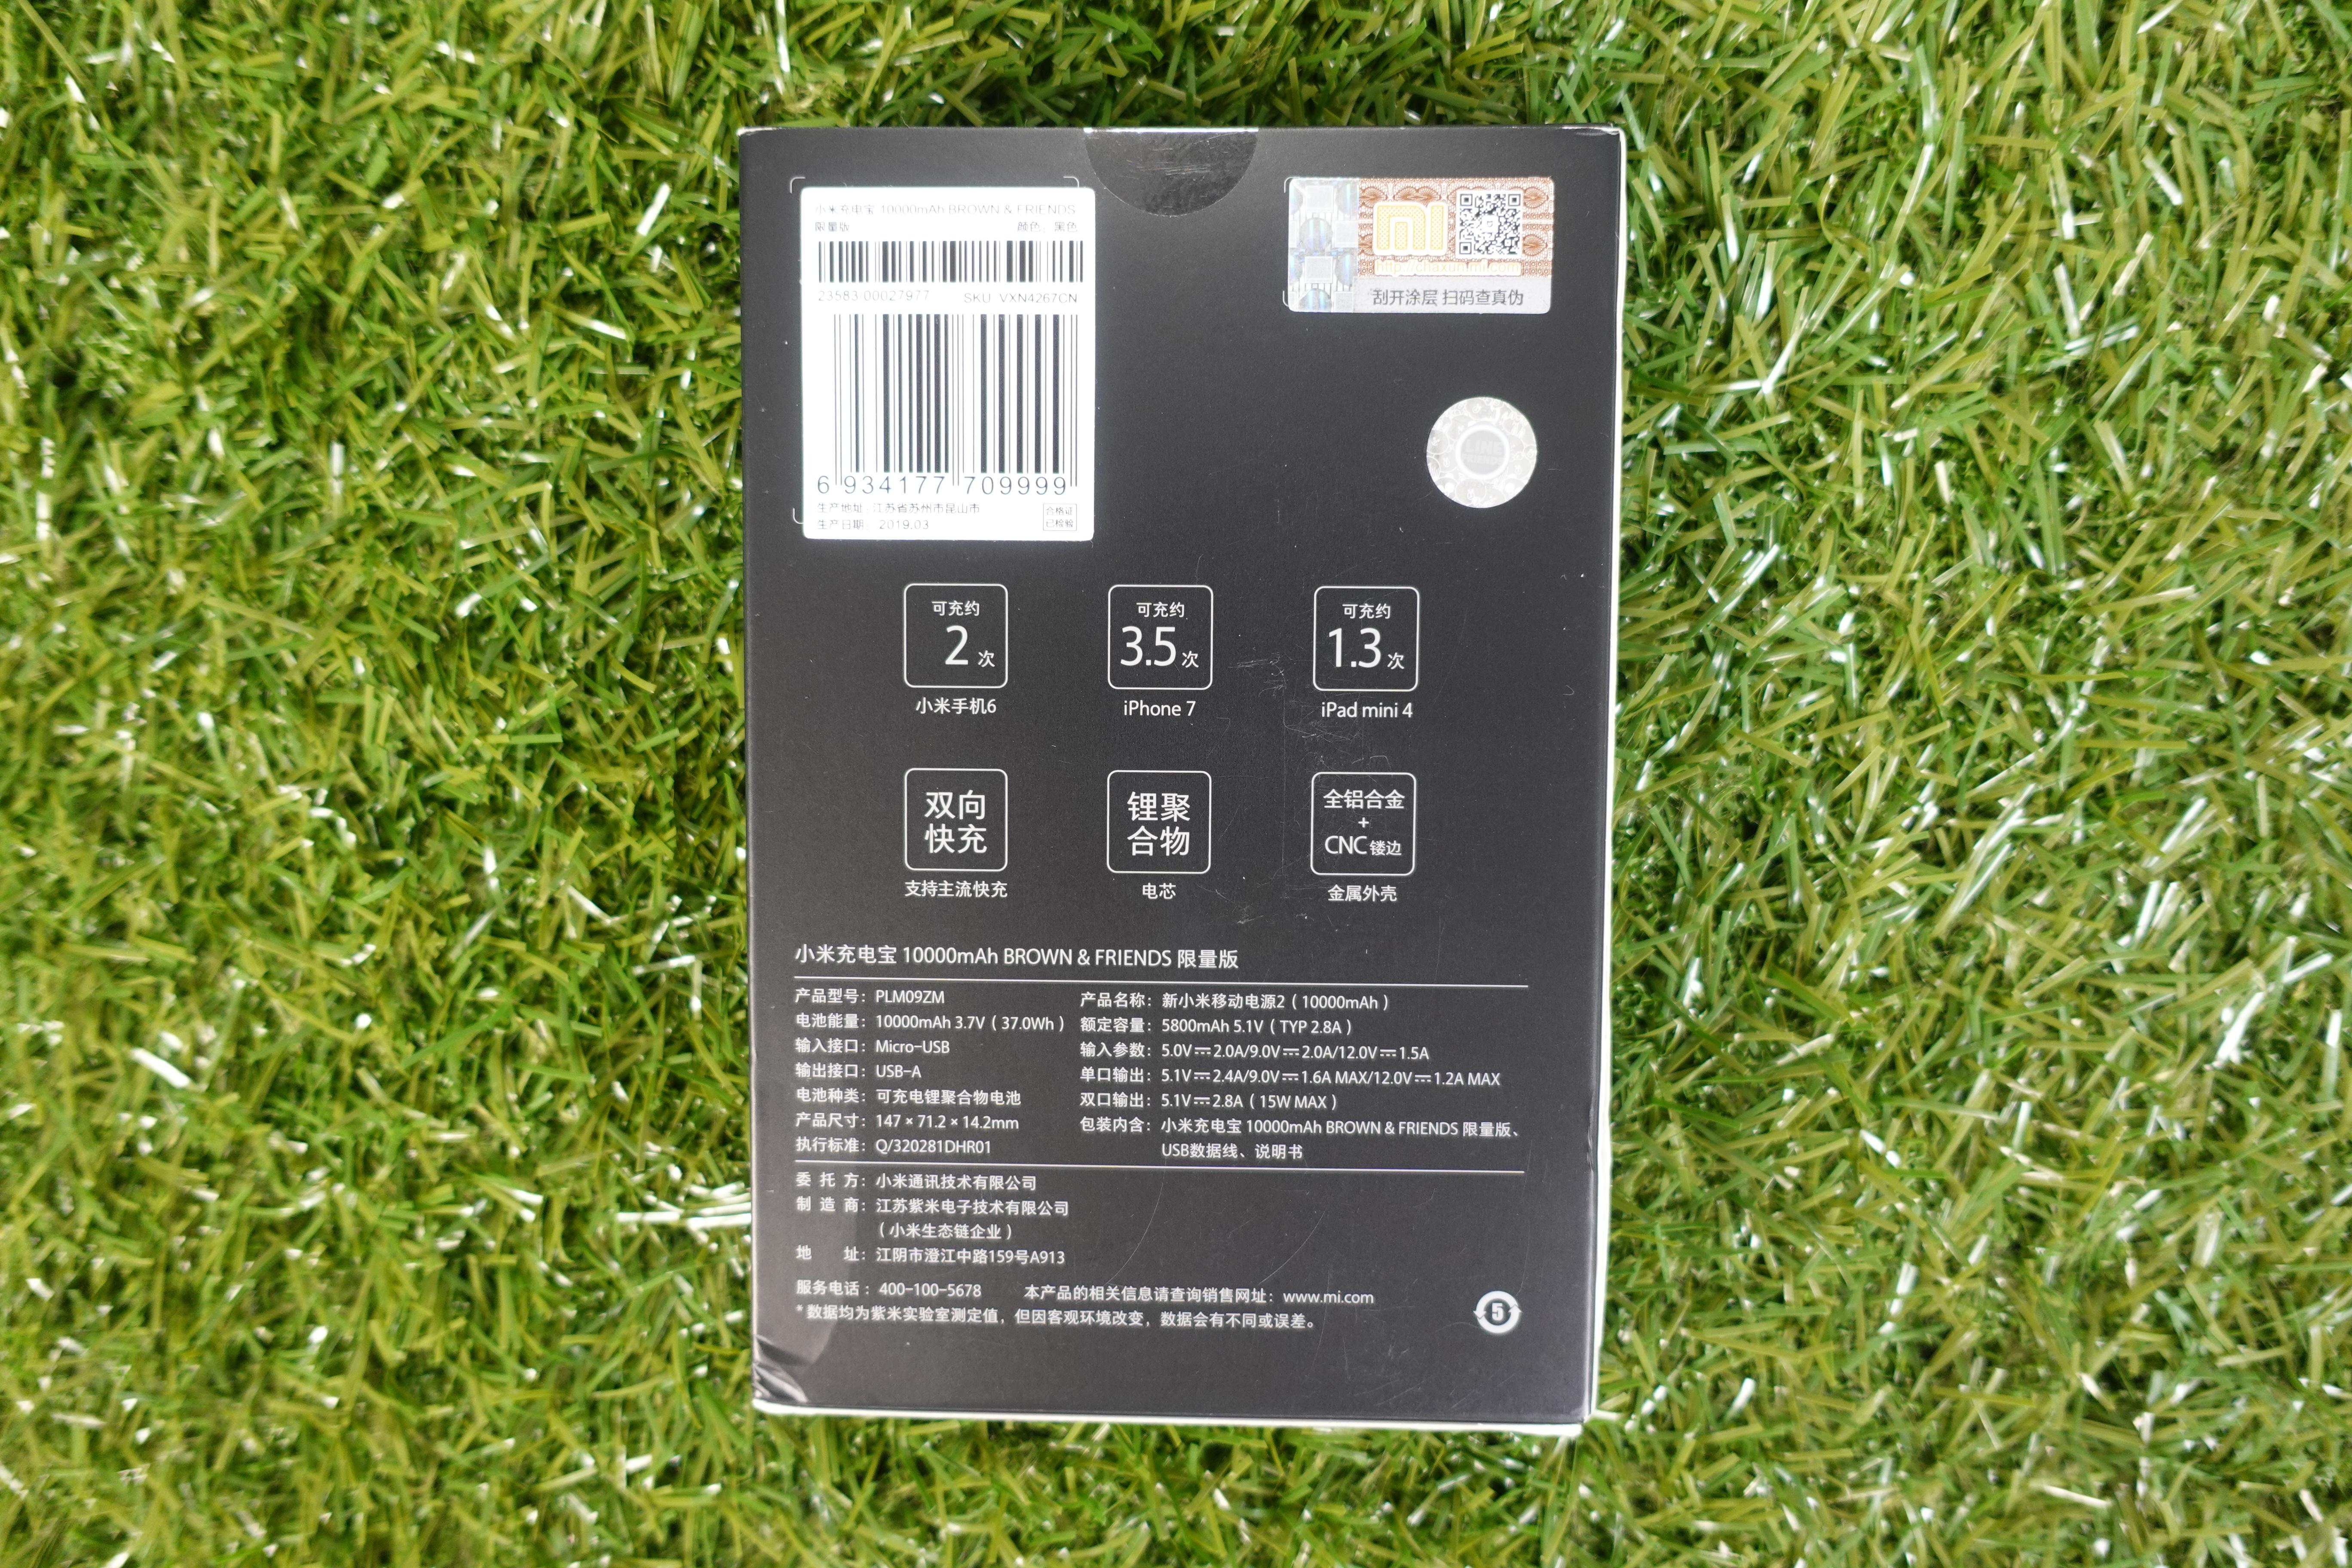 LINE FRIENDS 小米行動電源 全球限量版 盒裝背面